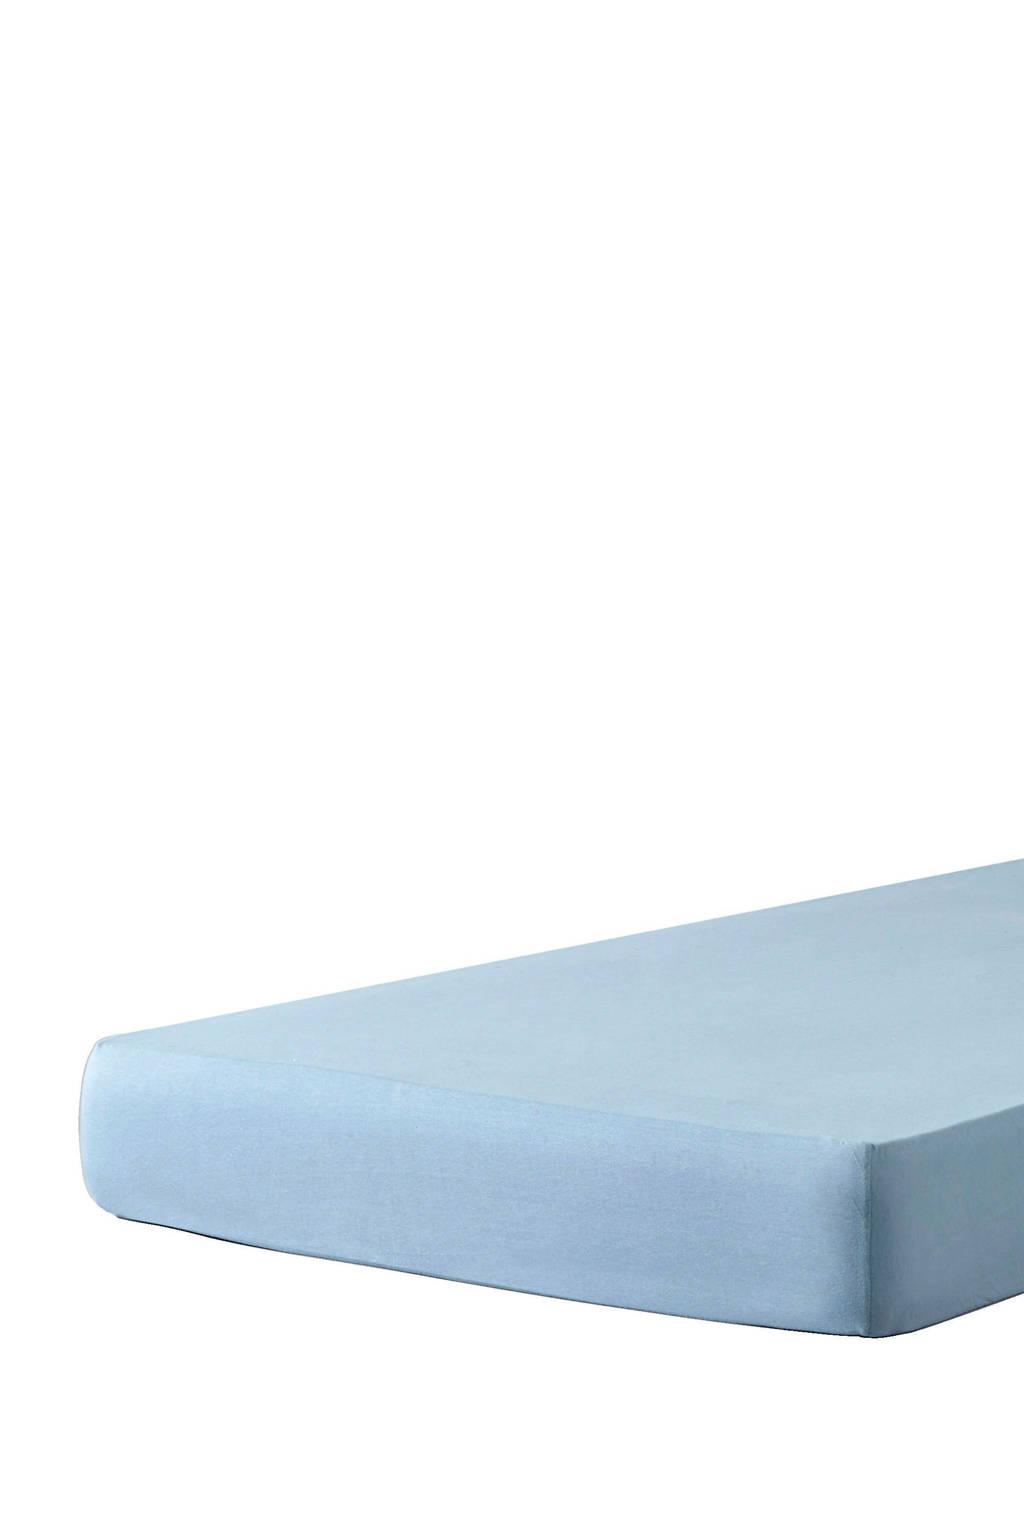 wehkamp home jersey ledikantbaby hoeslaken (60x120 cm), Lichtblauw